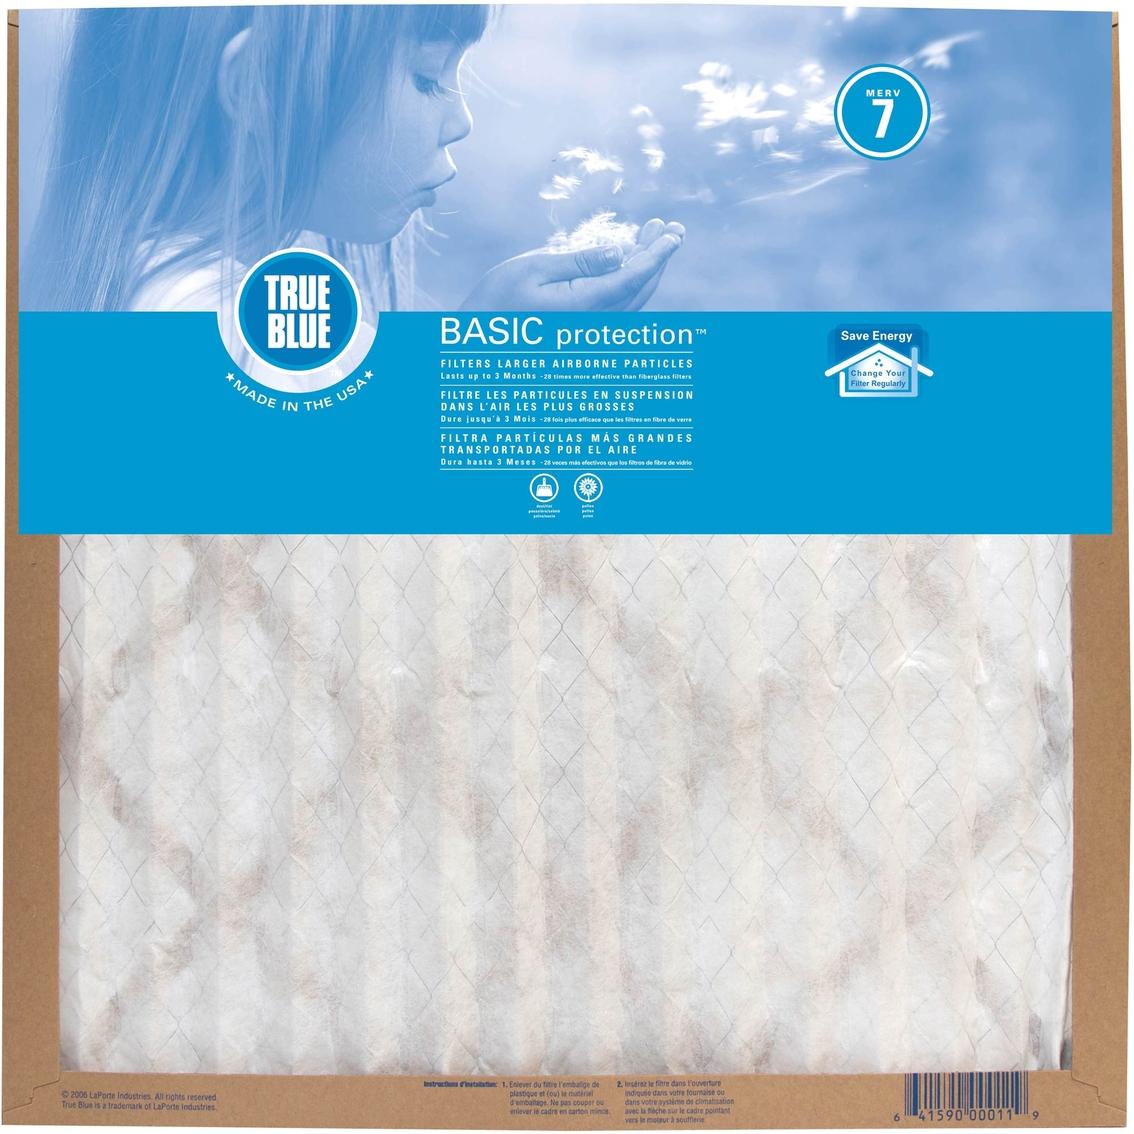 Protect plus true blue basic merv 7 pleated 90 day air filter 16 x protect plus true blue basic merv 7 pleated 90 day air filter 16 x 24 x 1 malvernweather Choice Image